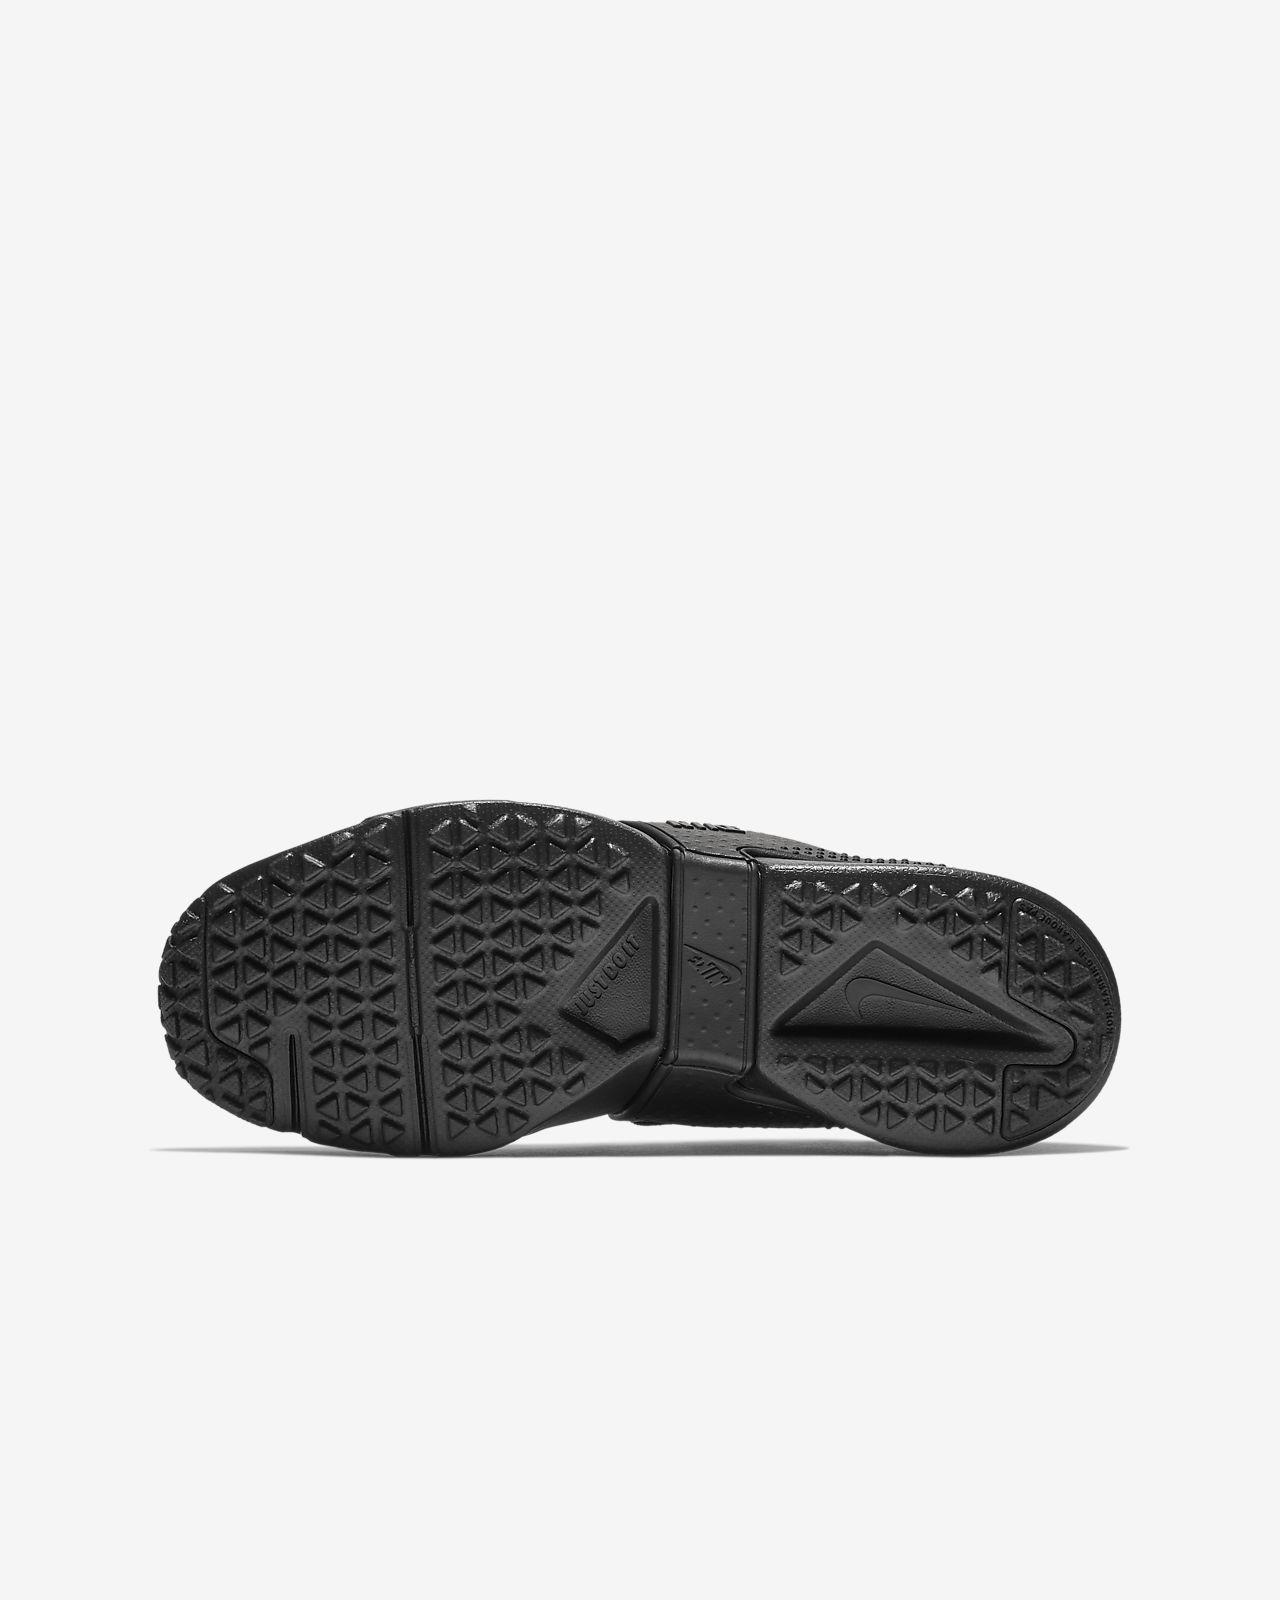 reputable site ee17b 30dcb ... Nike Huarache Extreme Big Kids Shoe